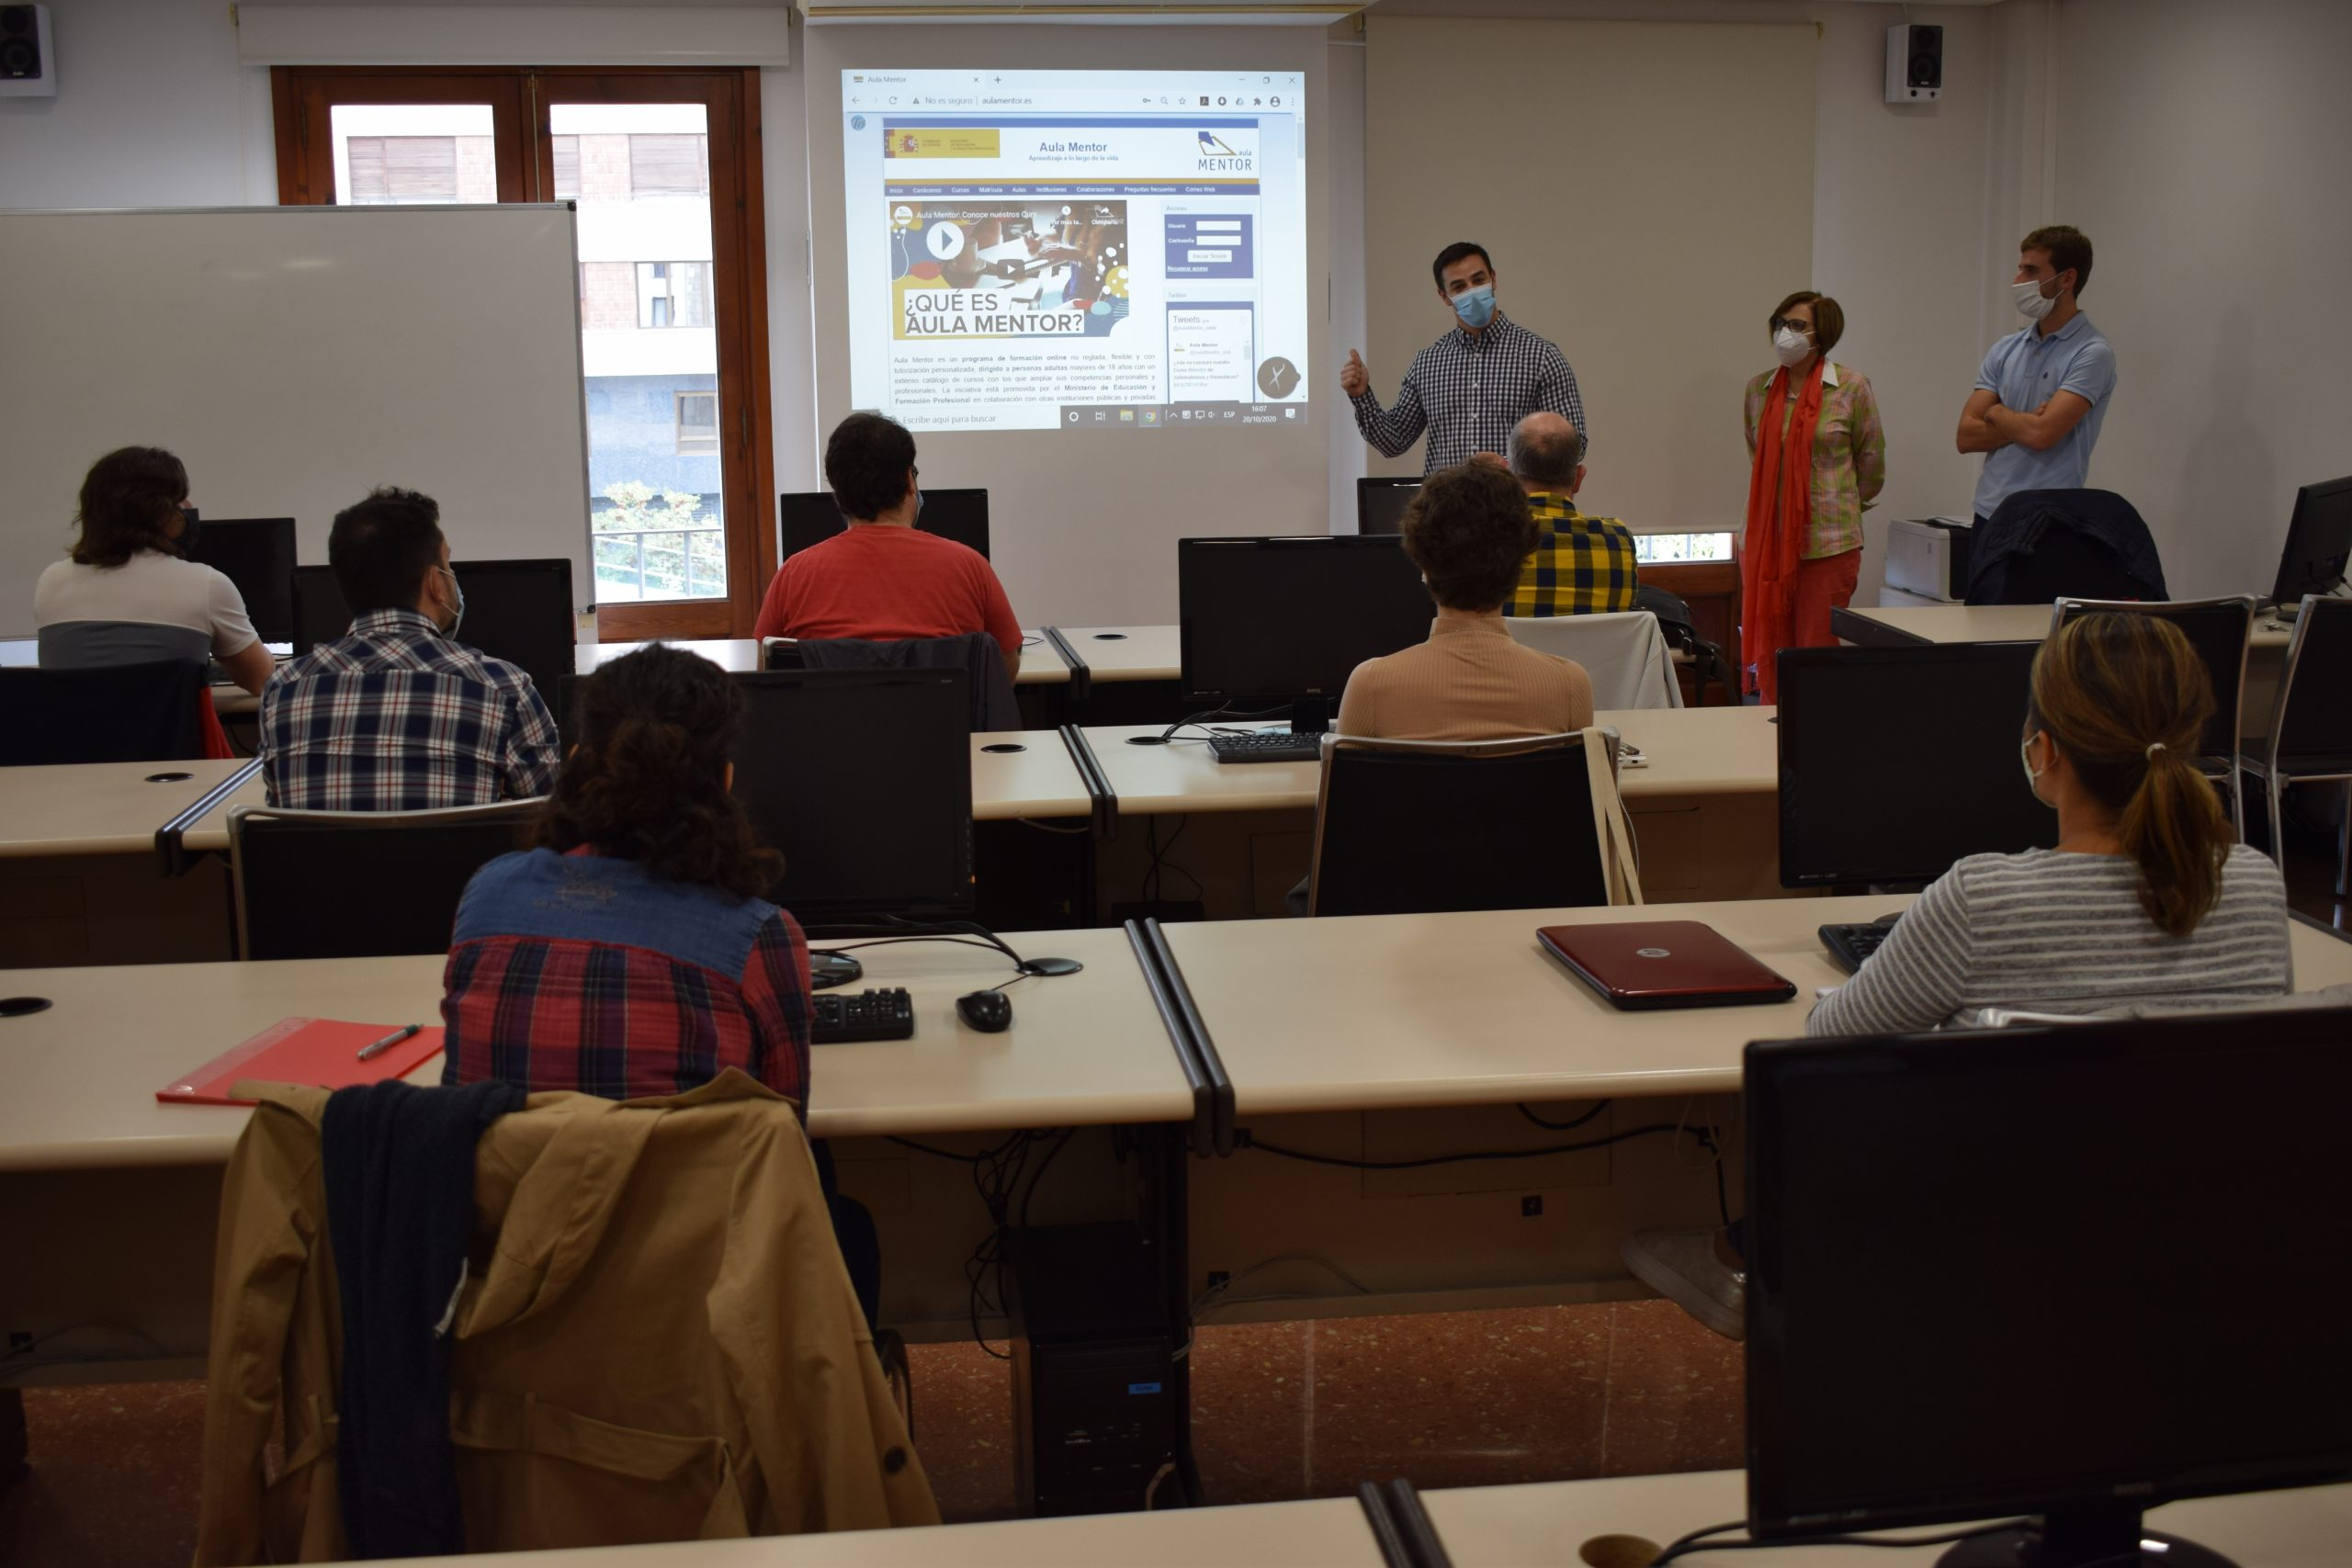 20 alumnos inician el Módulo de Especialización Profesional Aula Mentor Vila-real en Diseño Gráfico e Inkjet